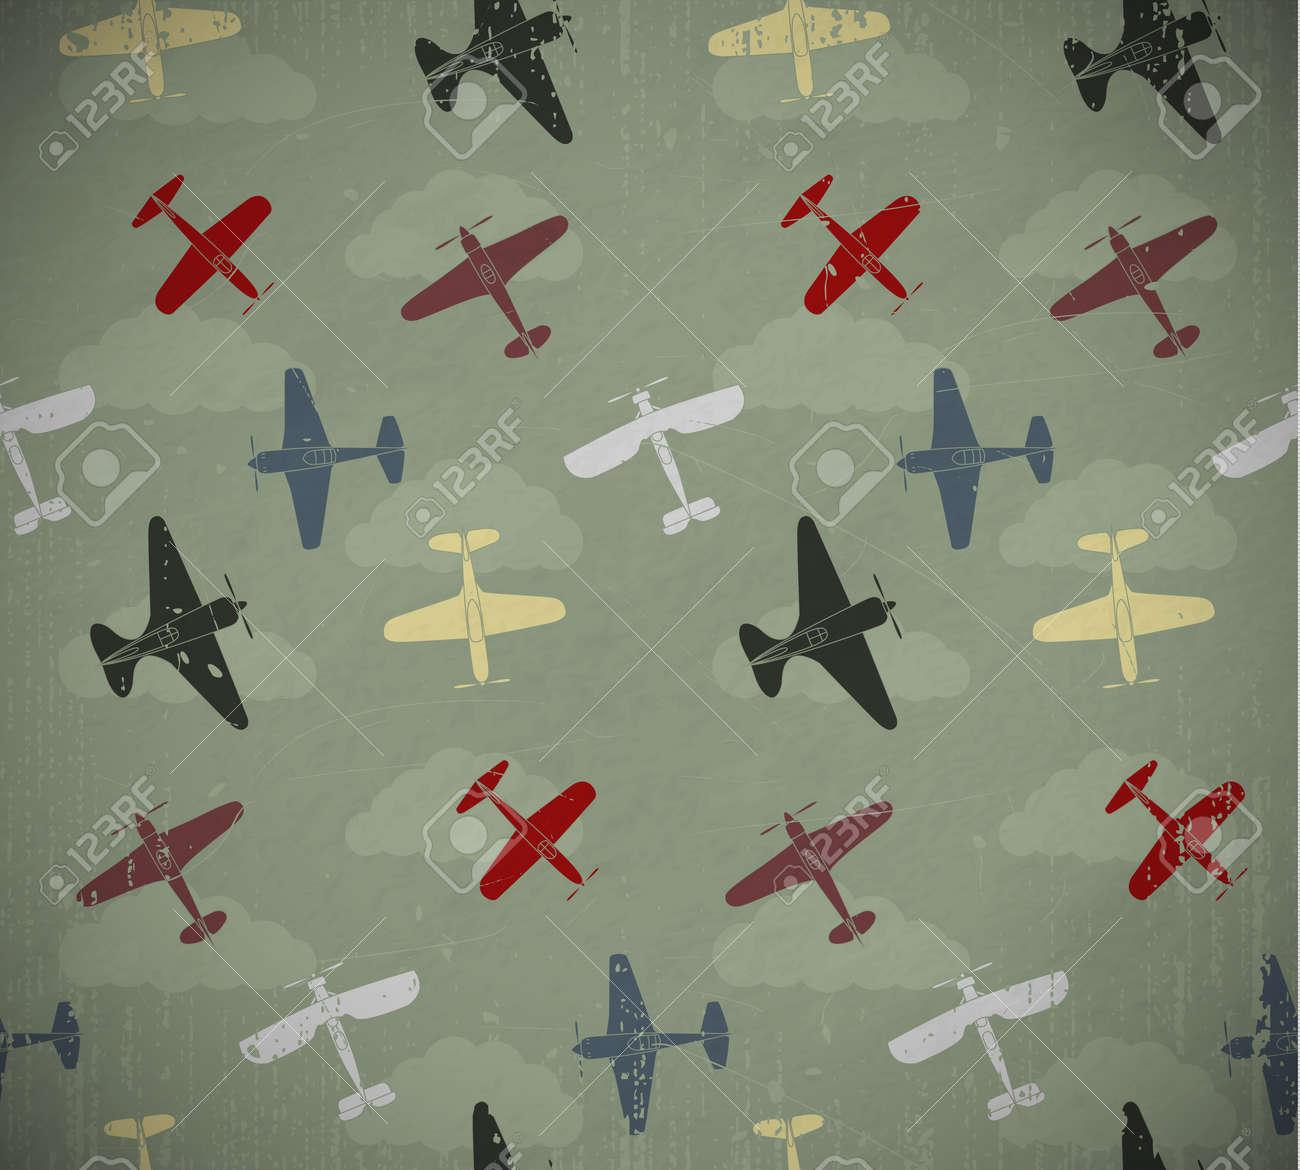 Retro seamless war planes pattern  EPS10 vector image Stock Vector - 16169291